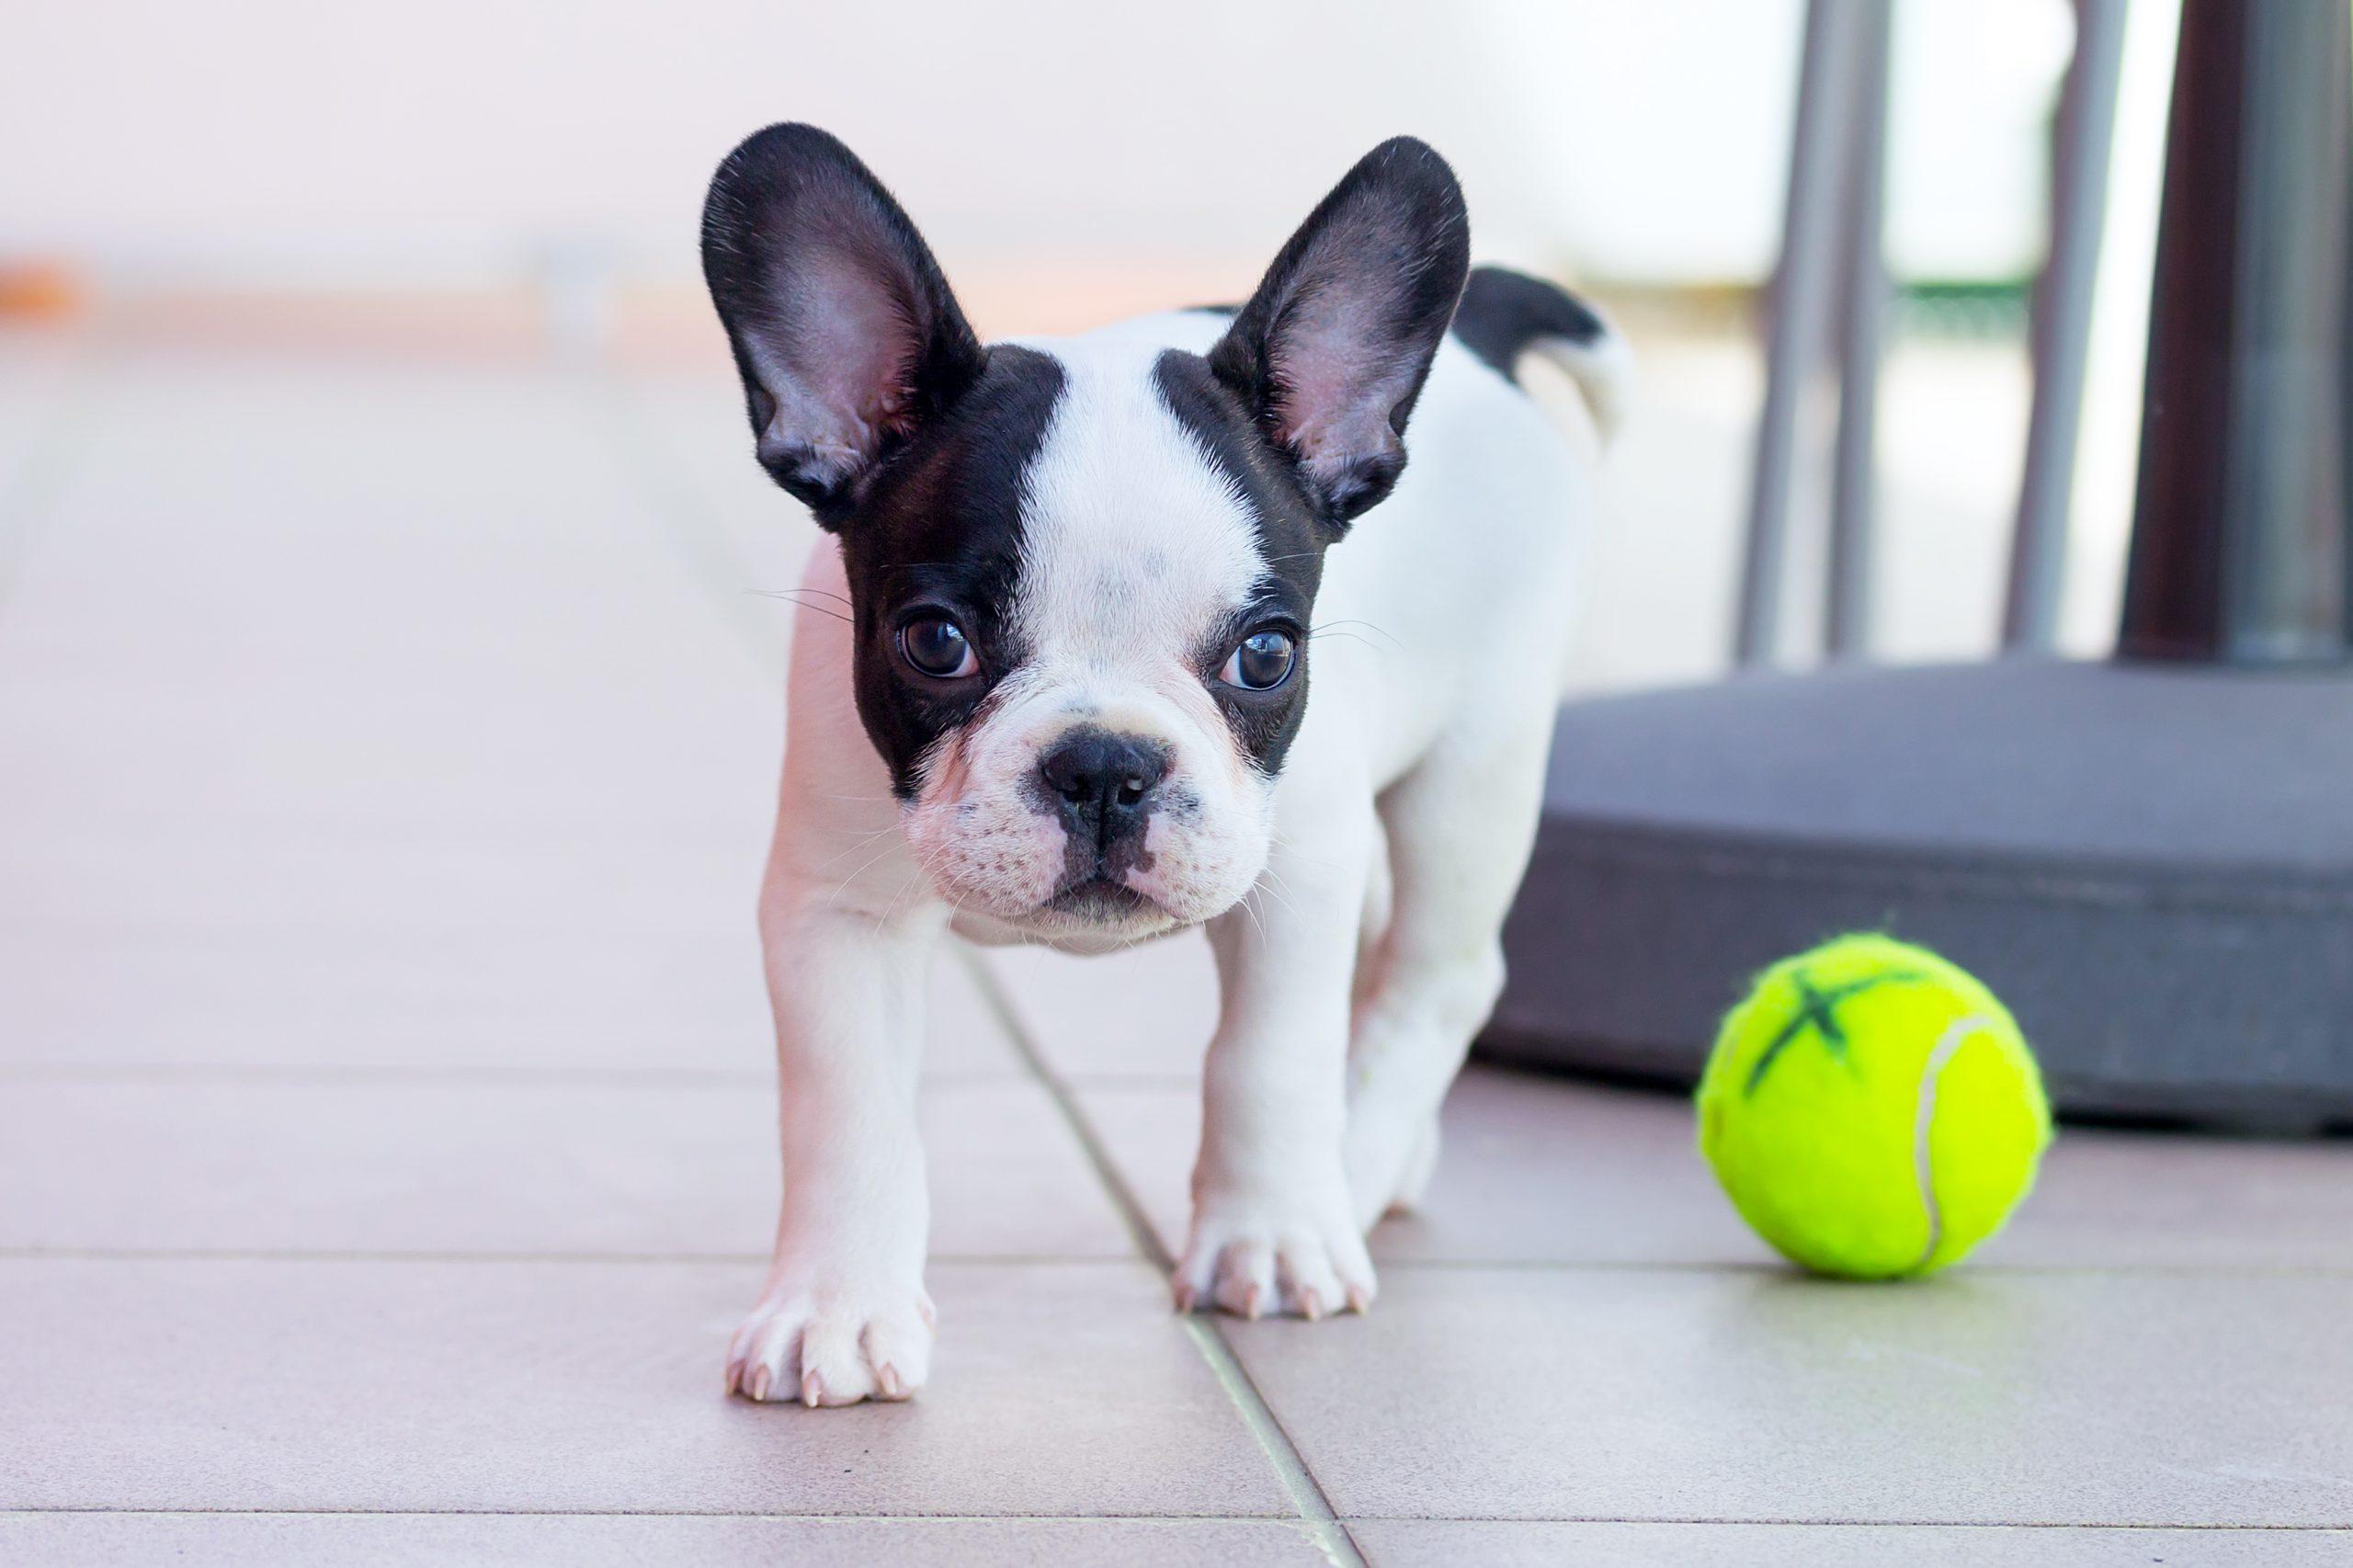 Polka Dot Dogs